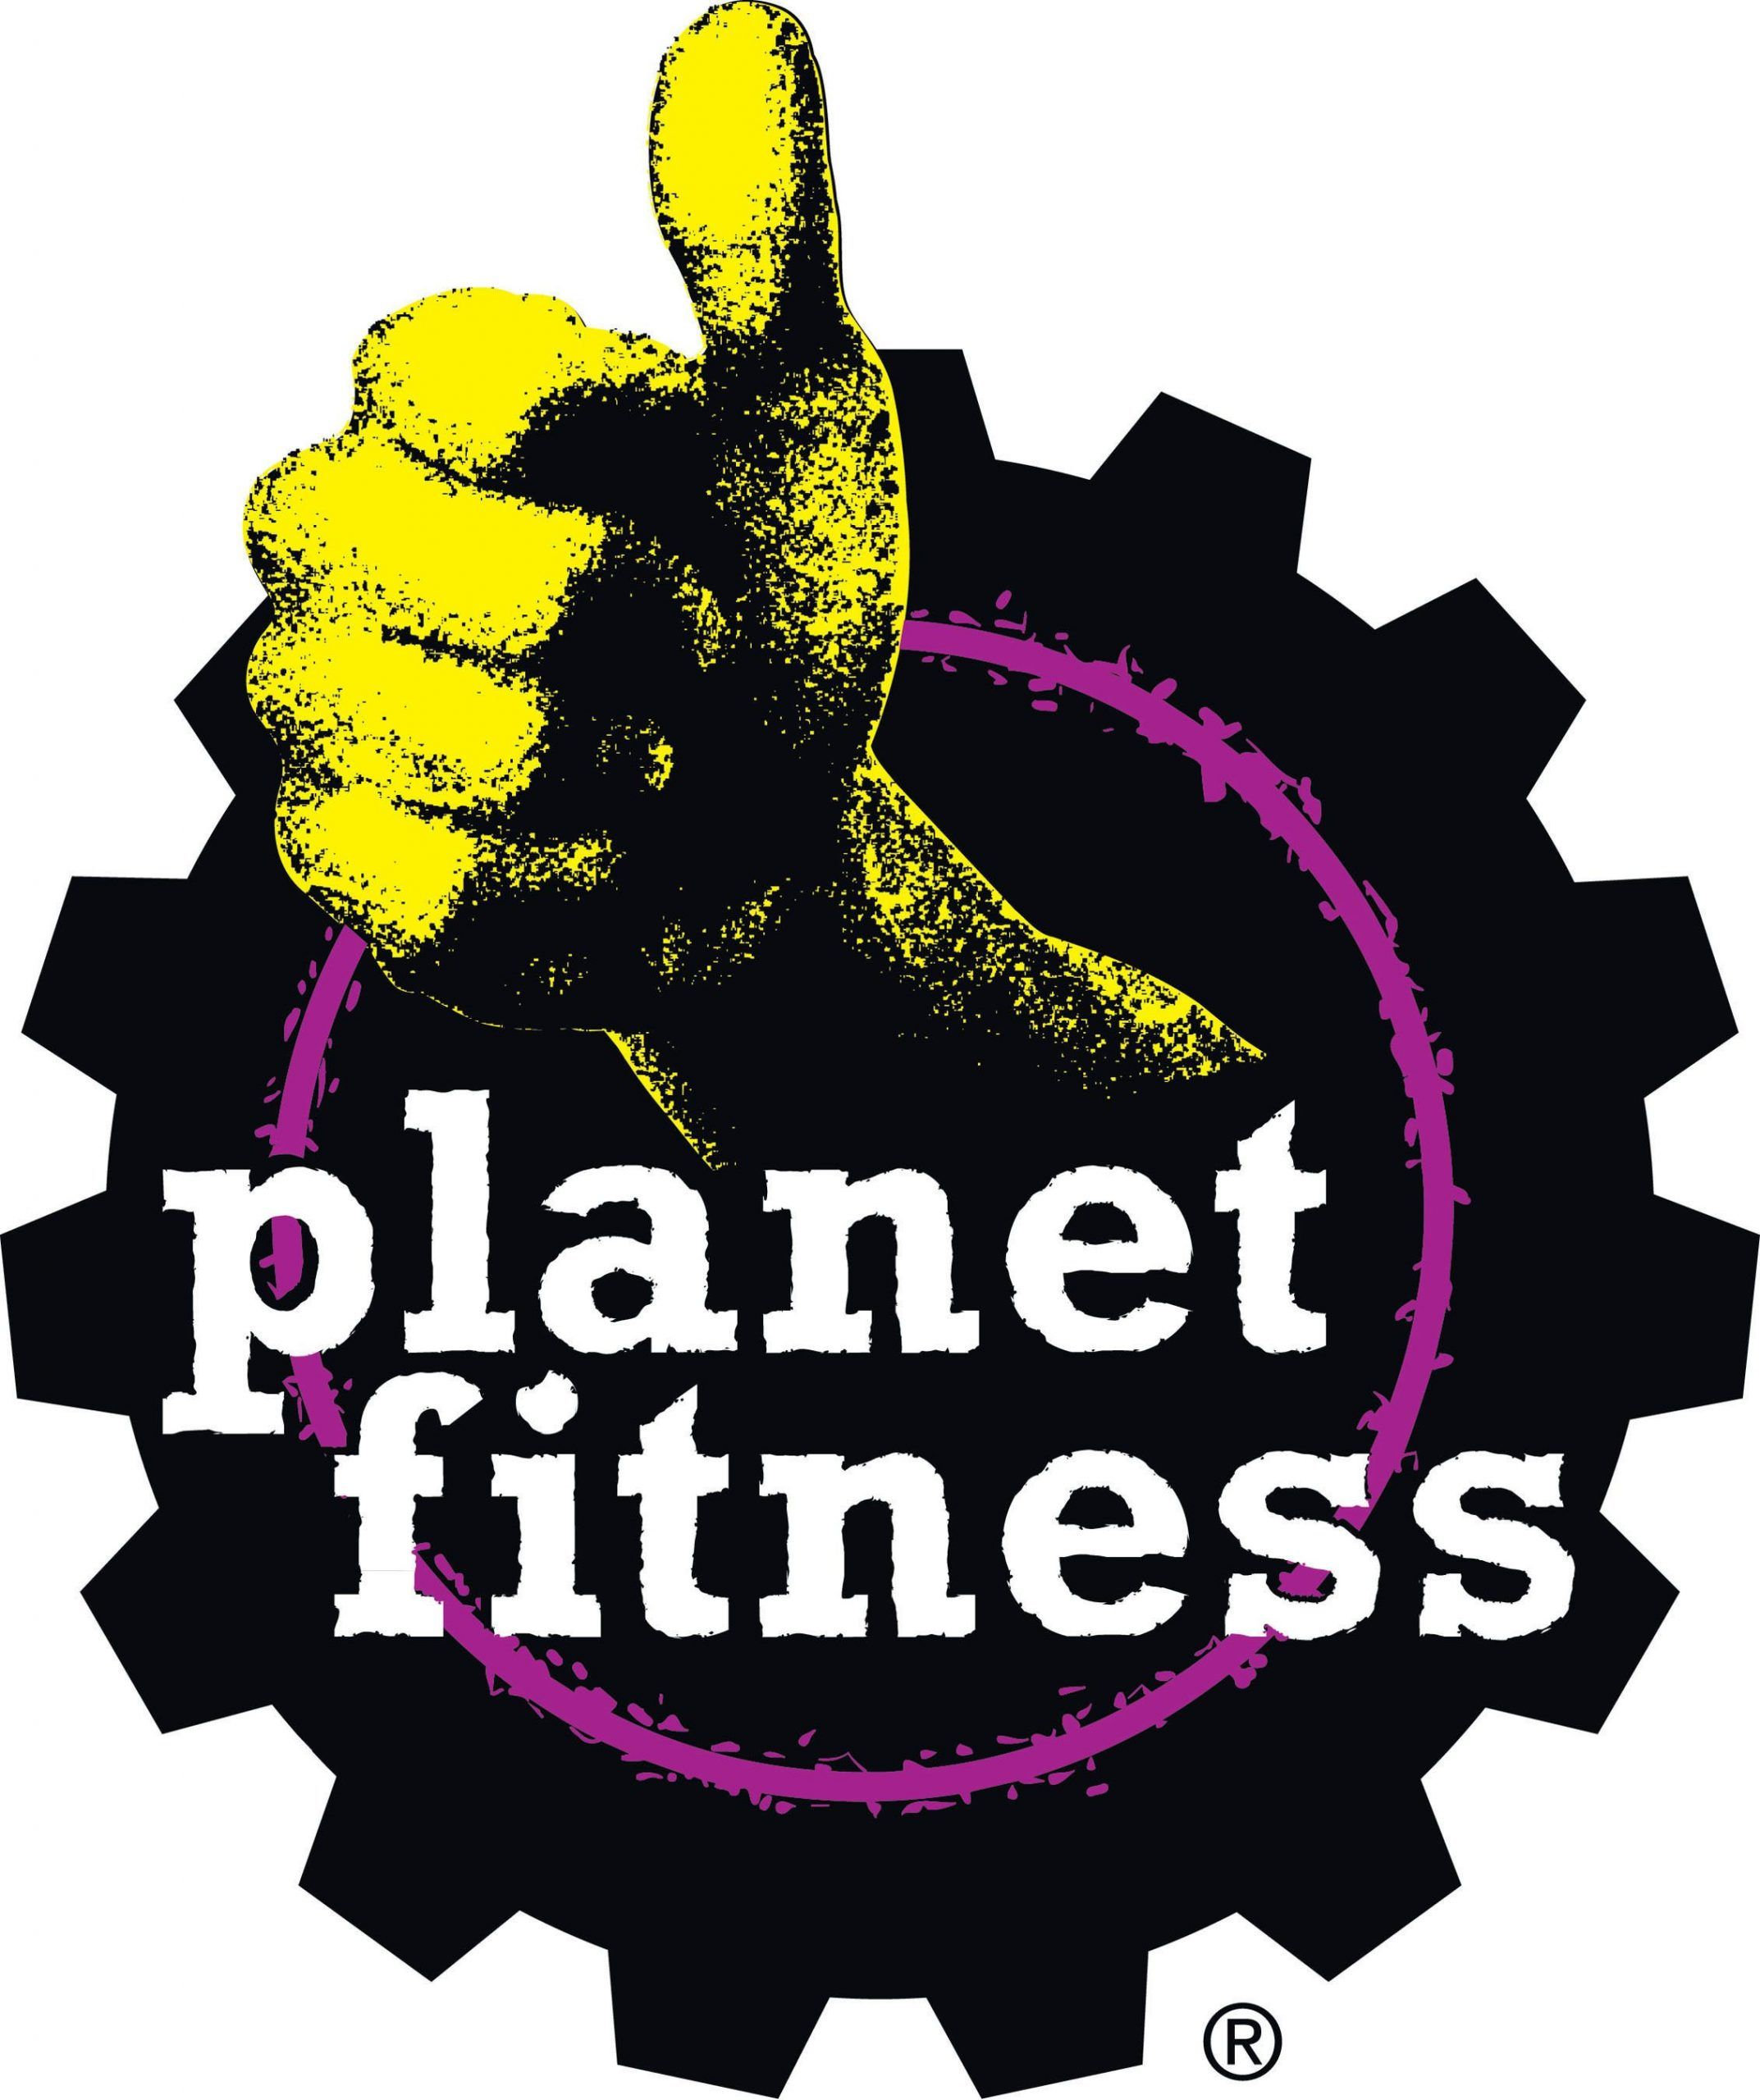 Planet Fitness Logo Images Fitness Images Logo Planet Planet Fitness Workout Planet Fitness Gym Fitness Logo